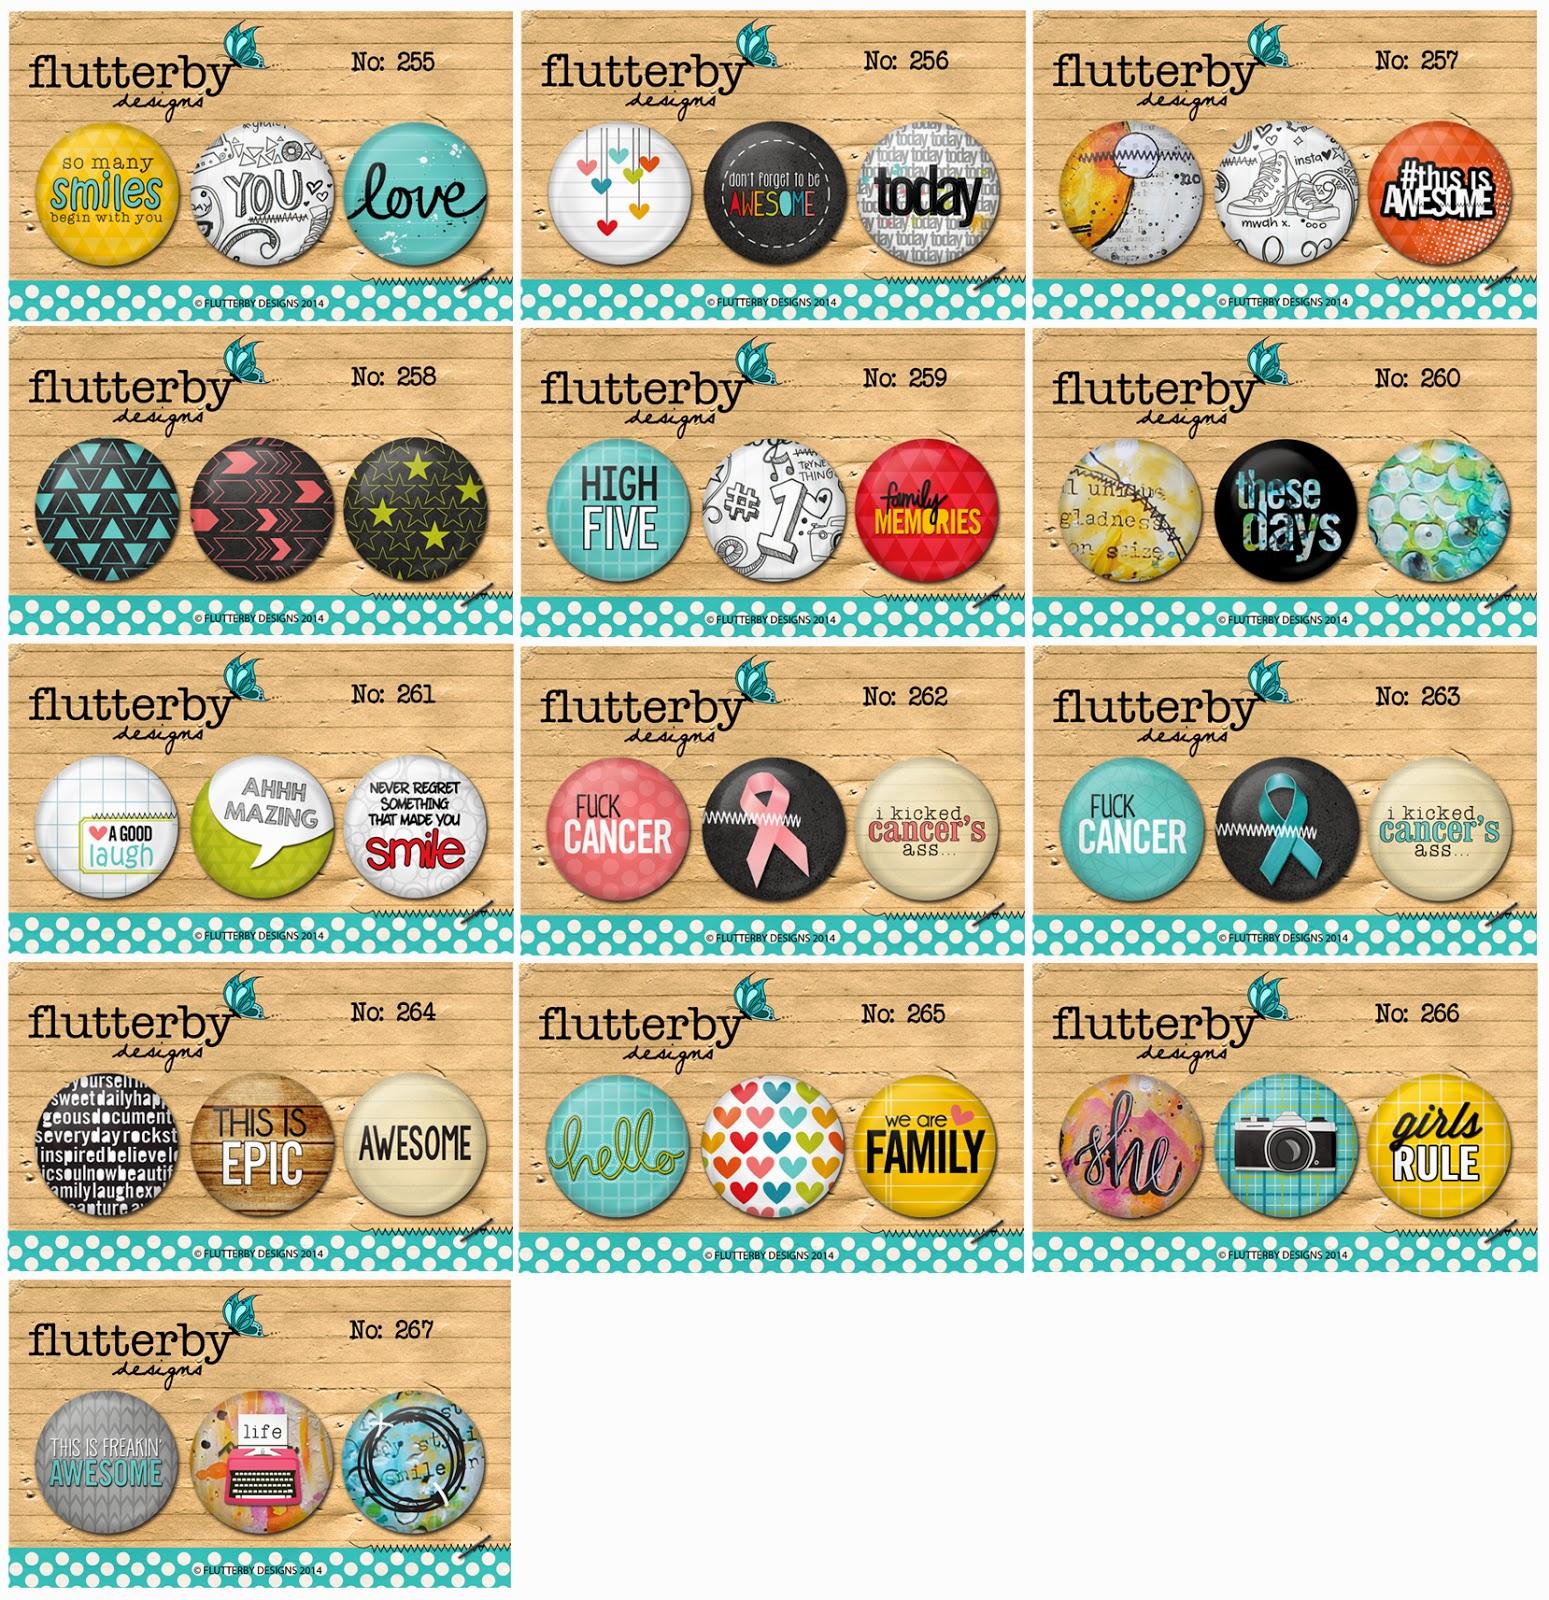 http://flutterbydesigns.bigcartel.com/product/1-flair-buttons-24